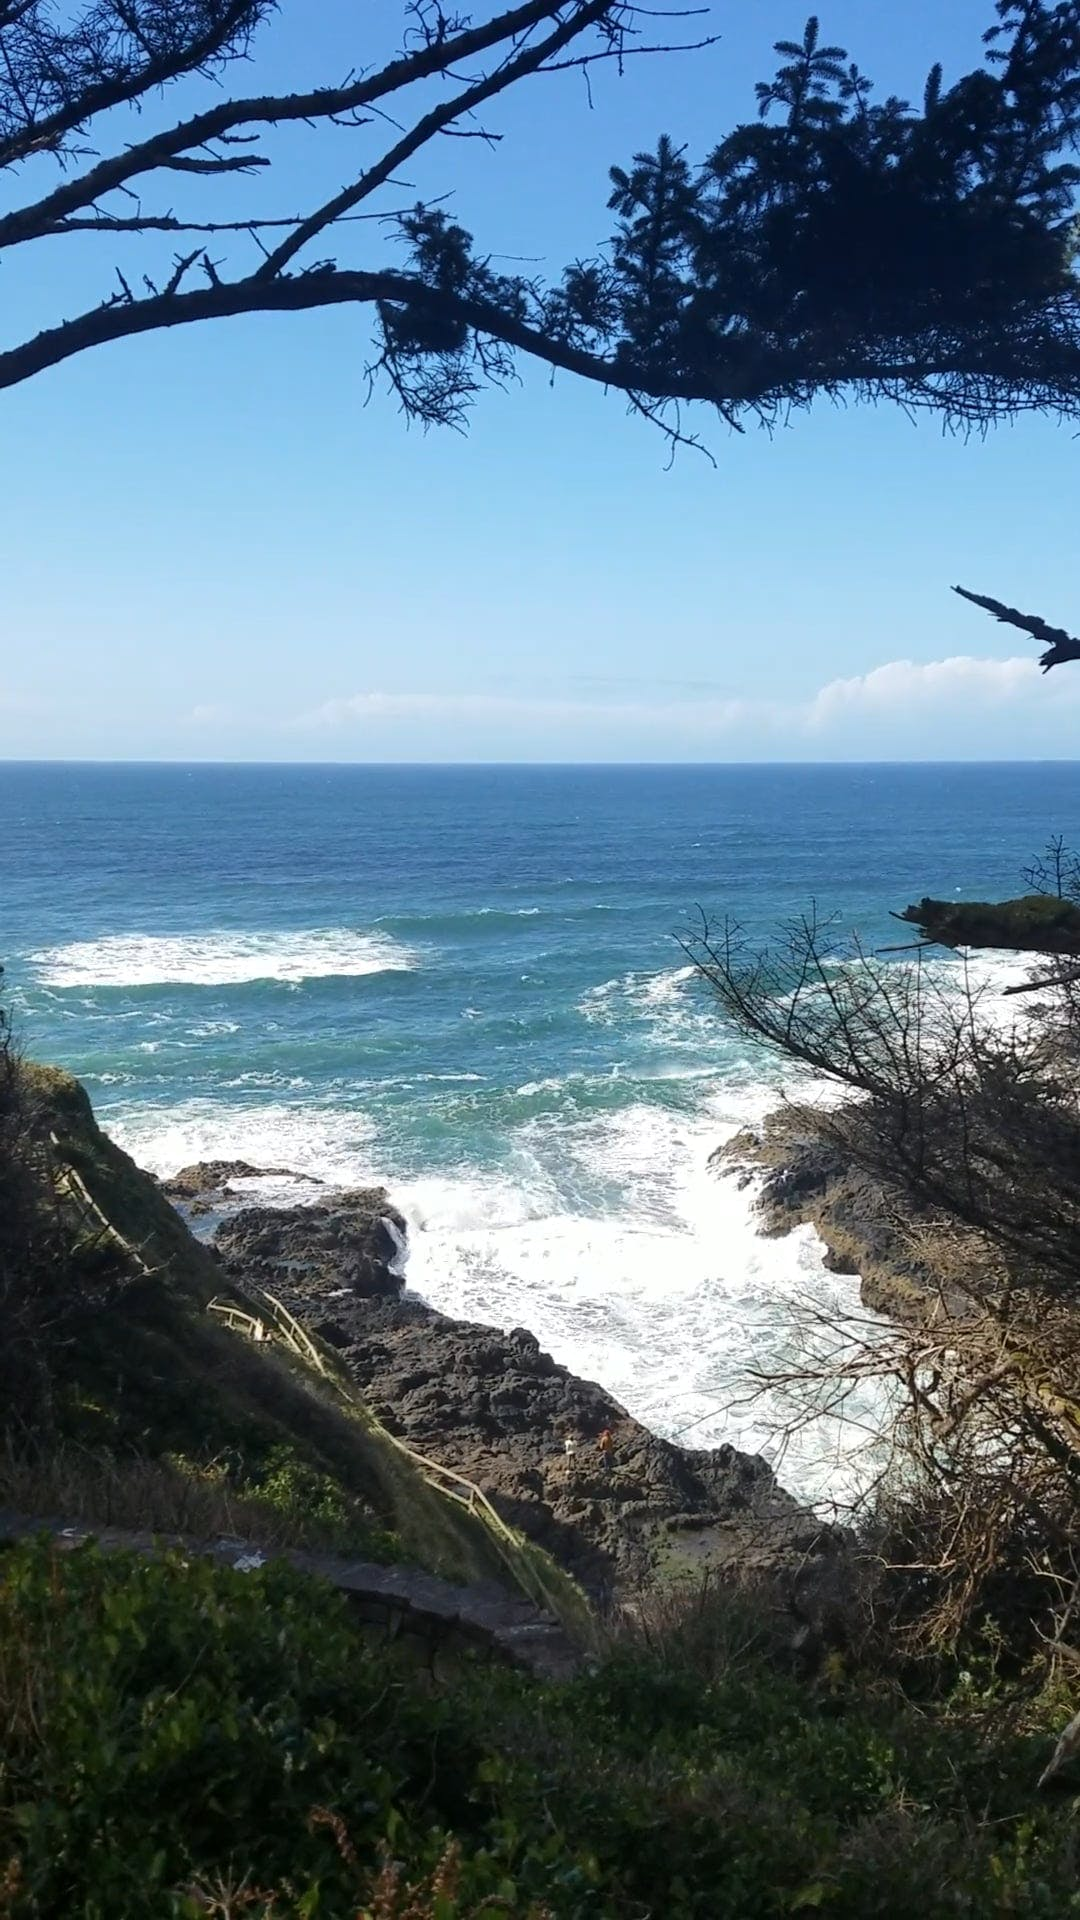 Big Waves Crashing To The Rocks